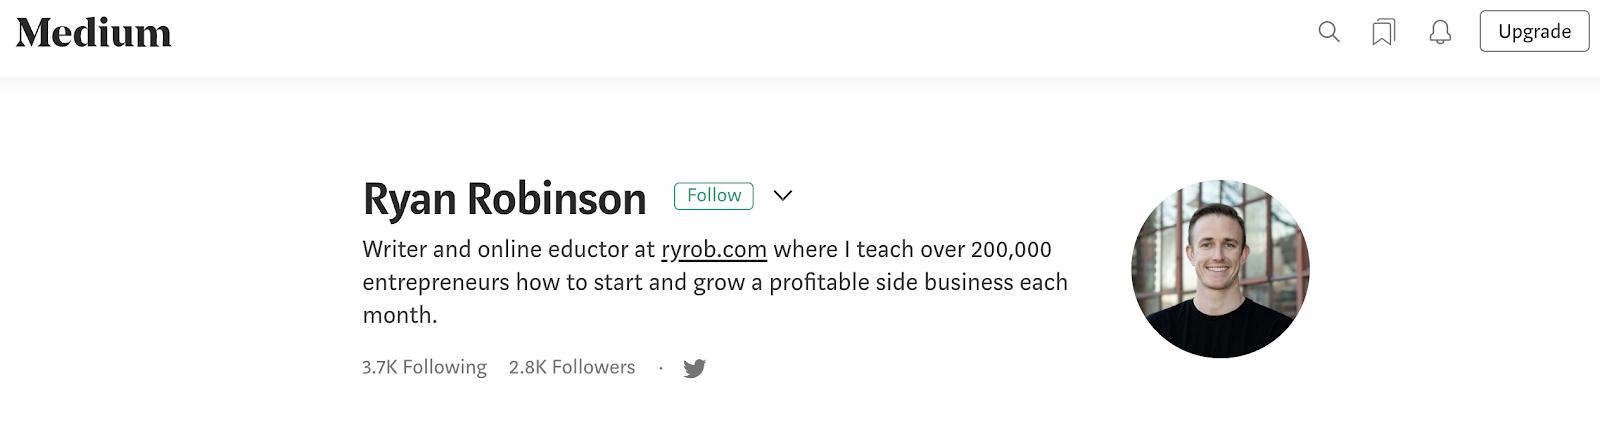 Screenshot of Ryan Robinson's Medium Account (Image)